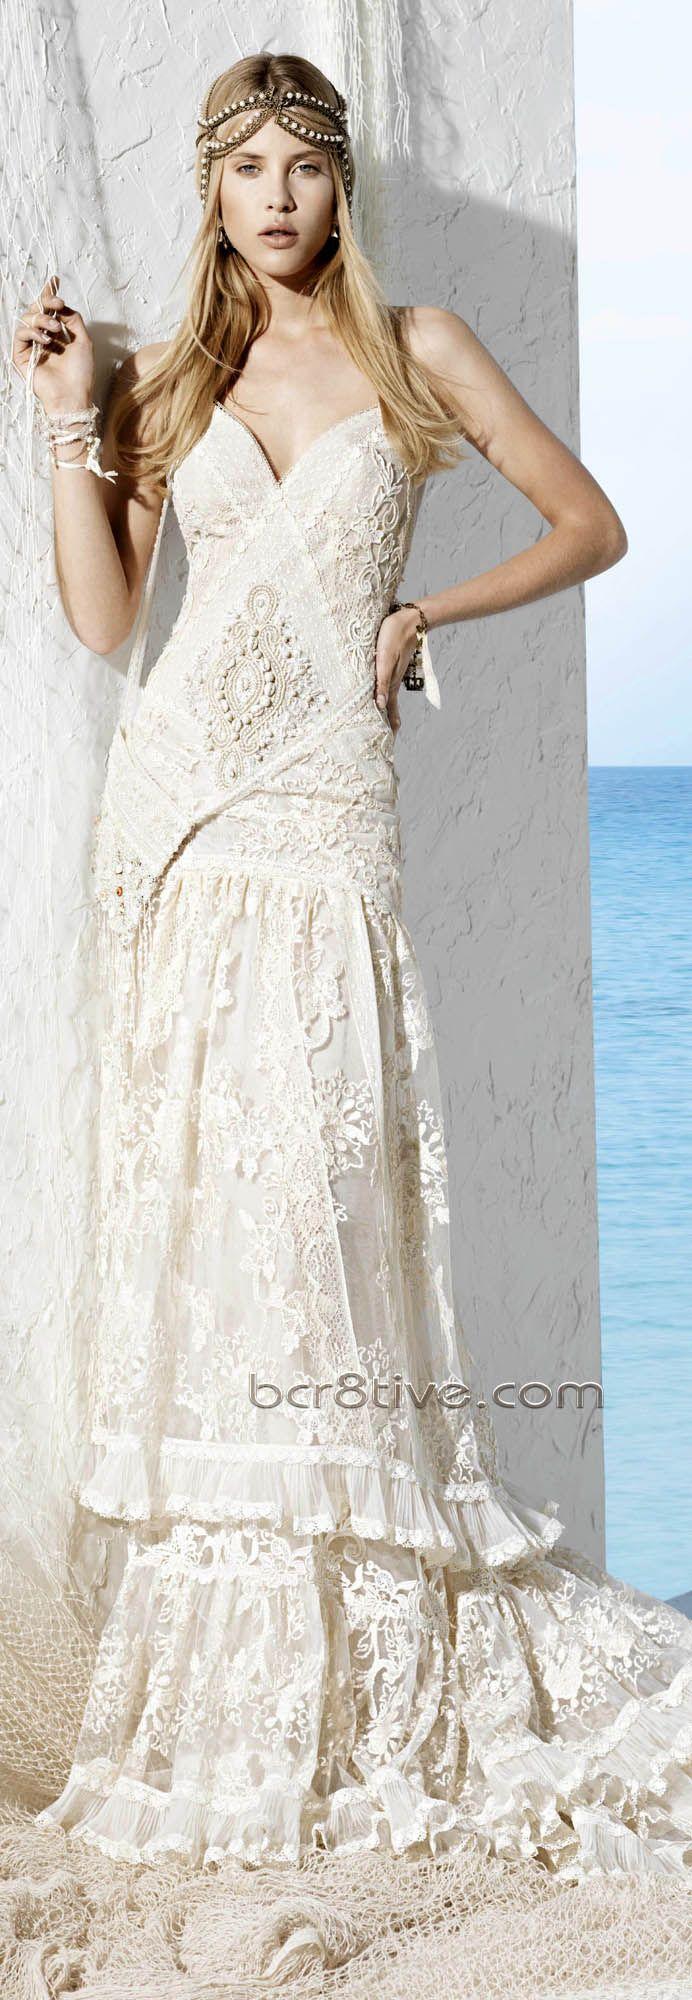 Boho wedding dressi think i found my wedding dress clothes